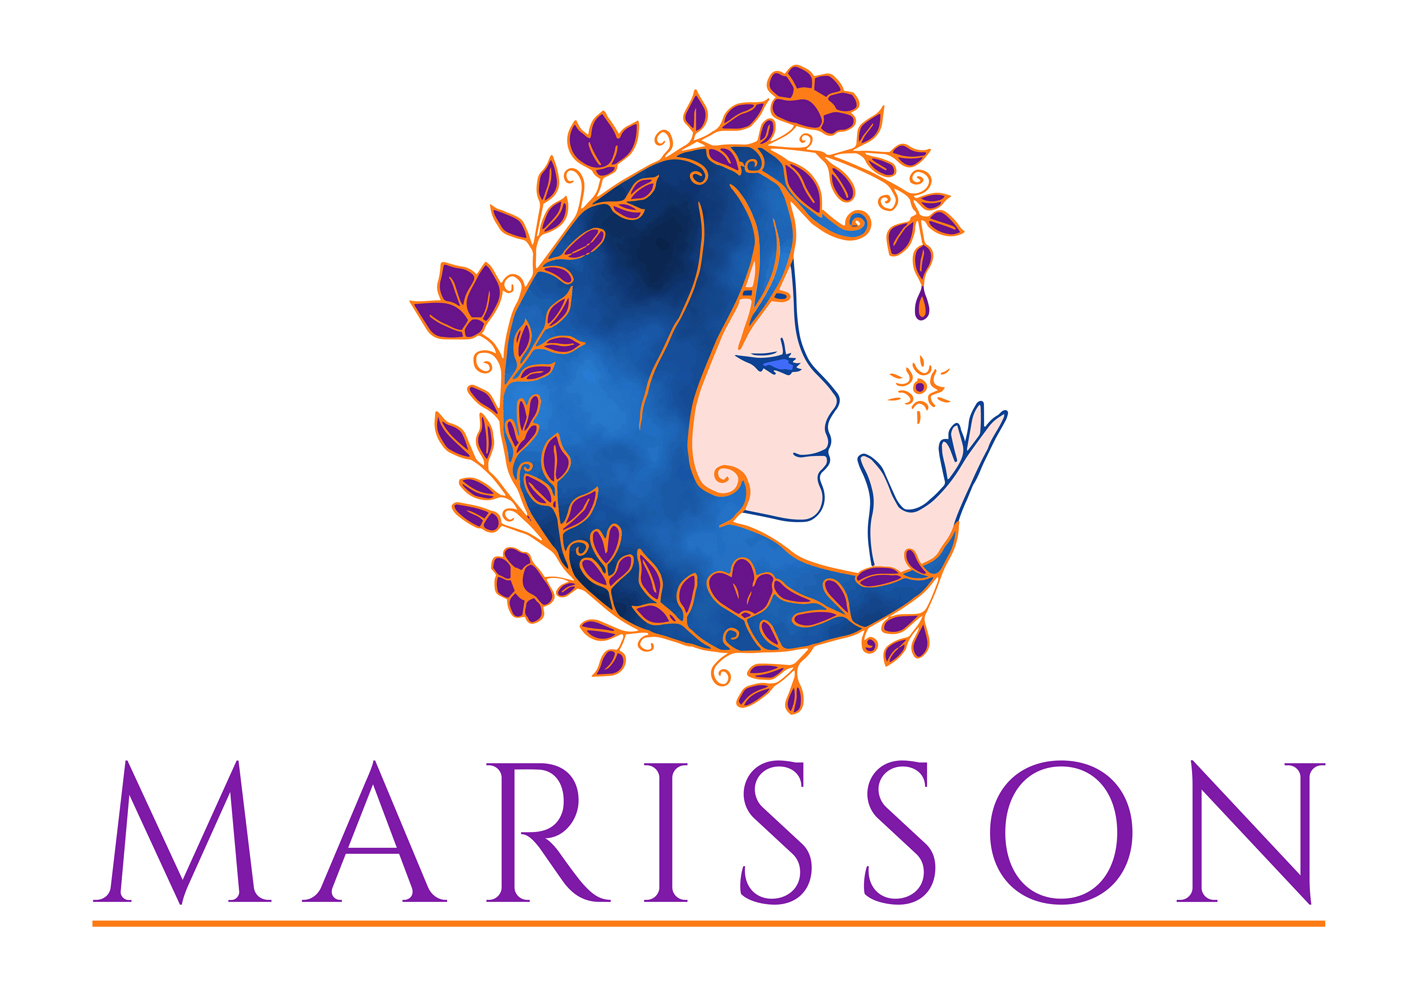 MARISSON ***